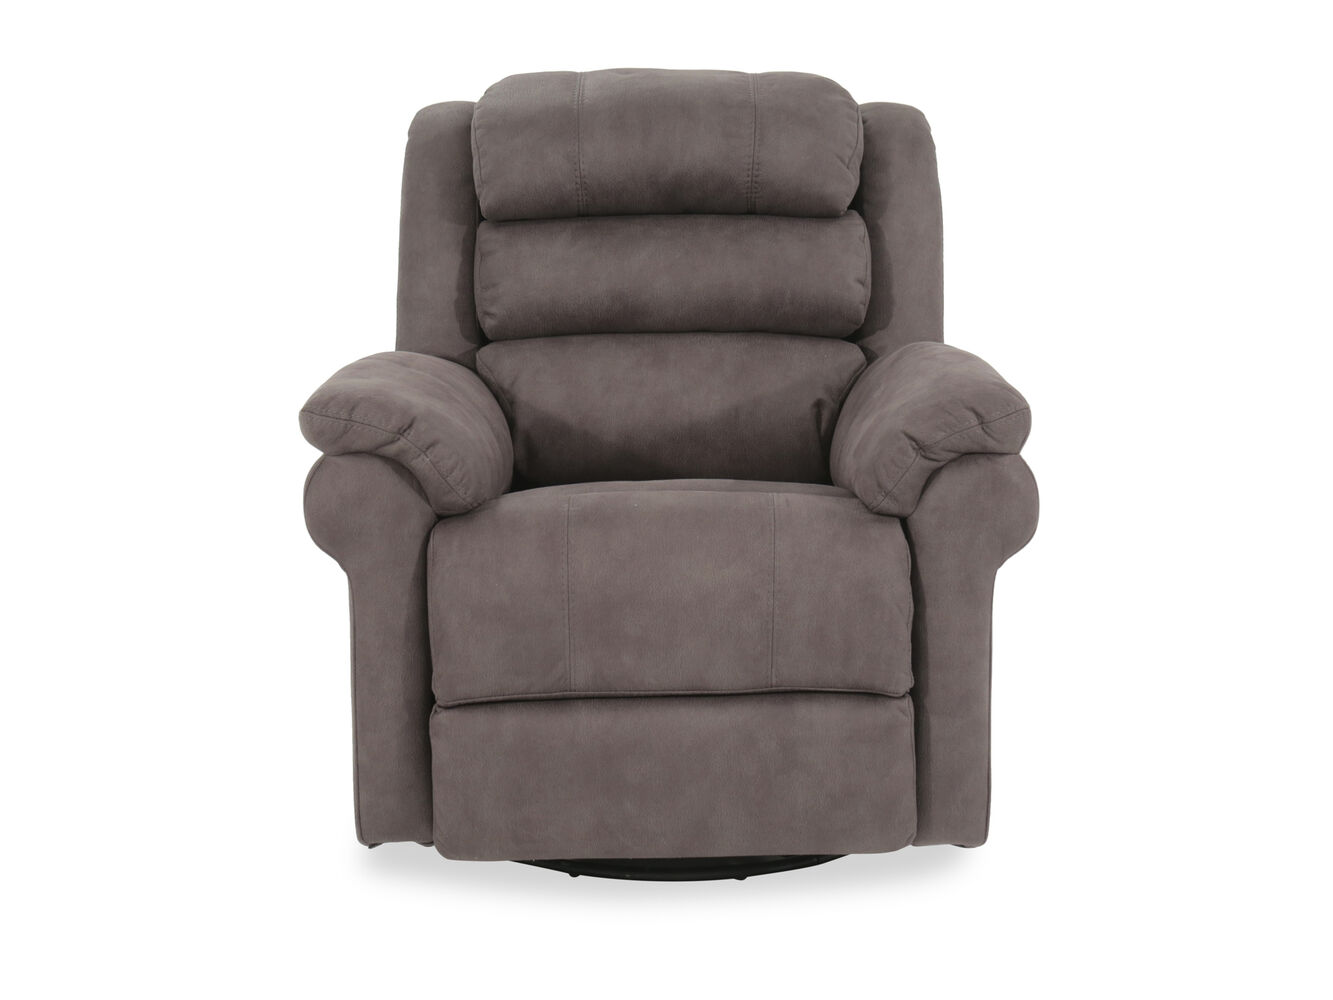 boulevard gray power swivel glider recliner mathis brothers furniture. Black Bedroom Furniture Sets. Home Design Ideas